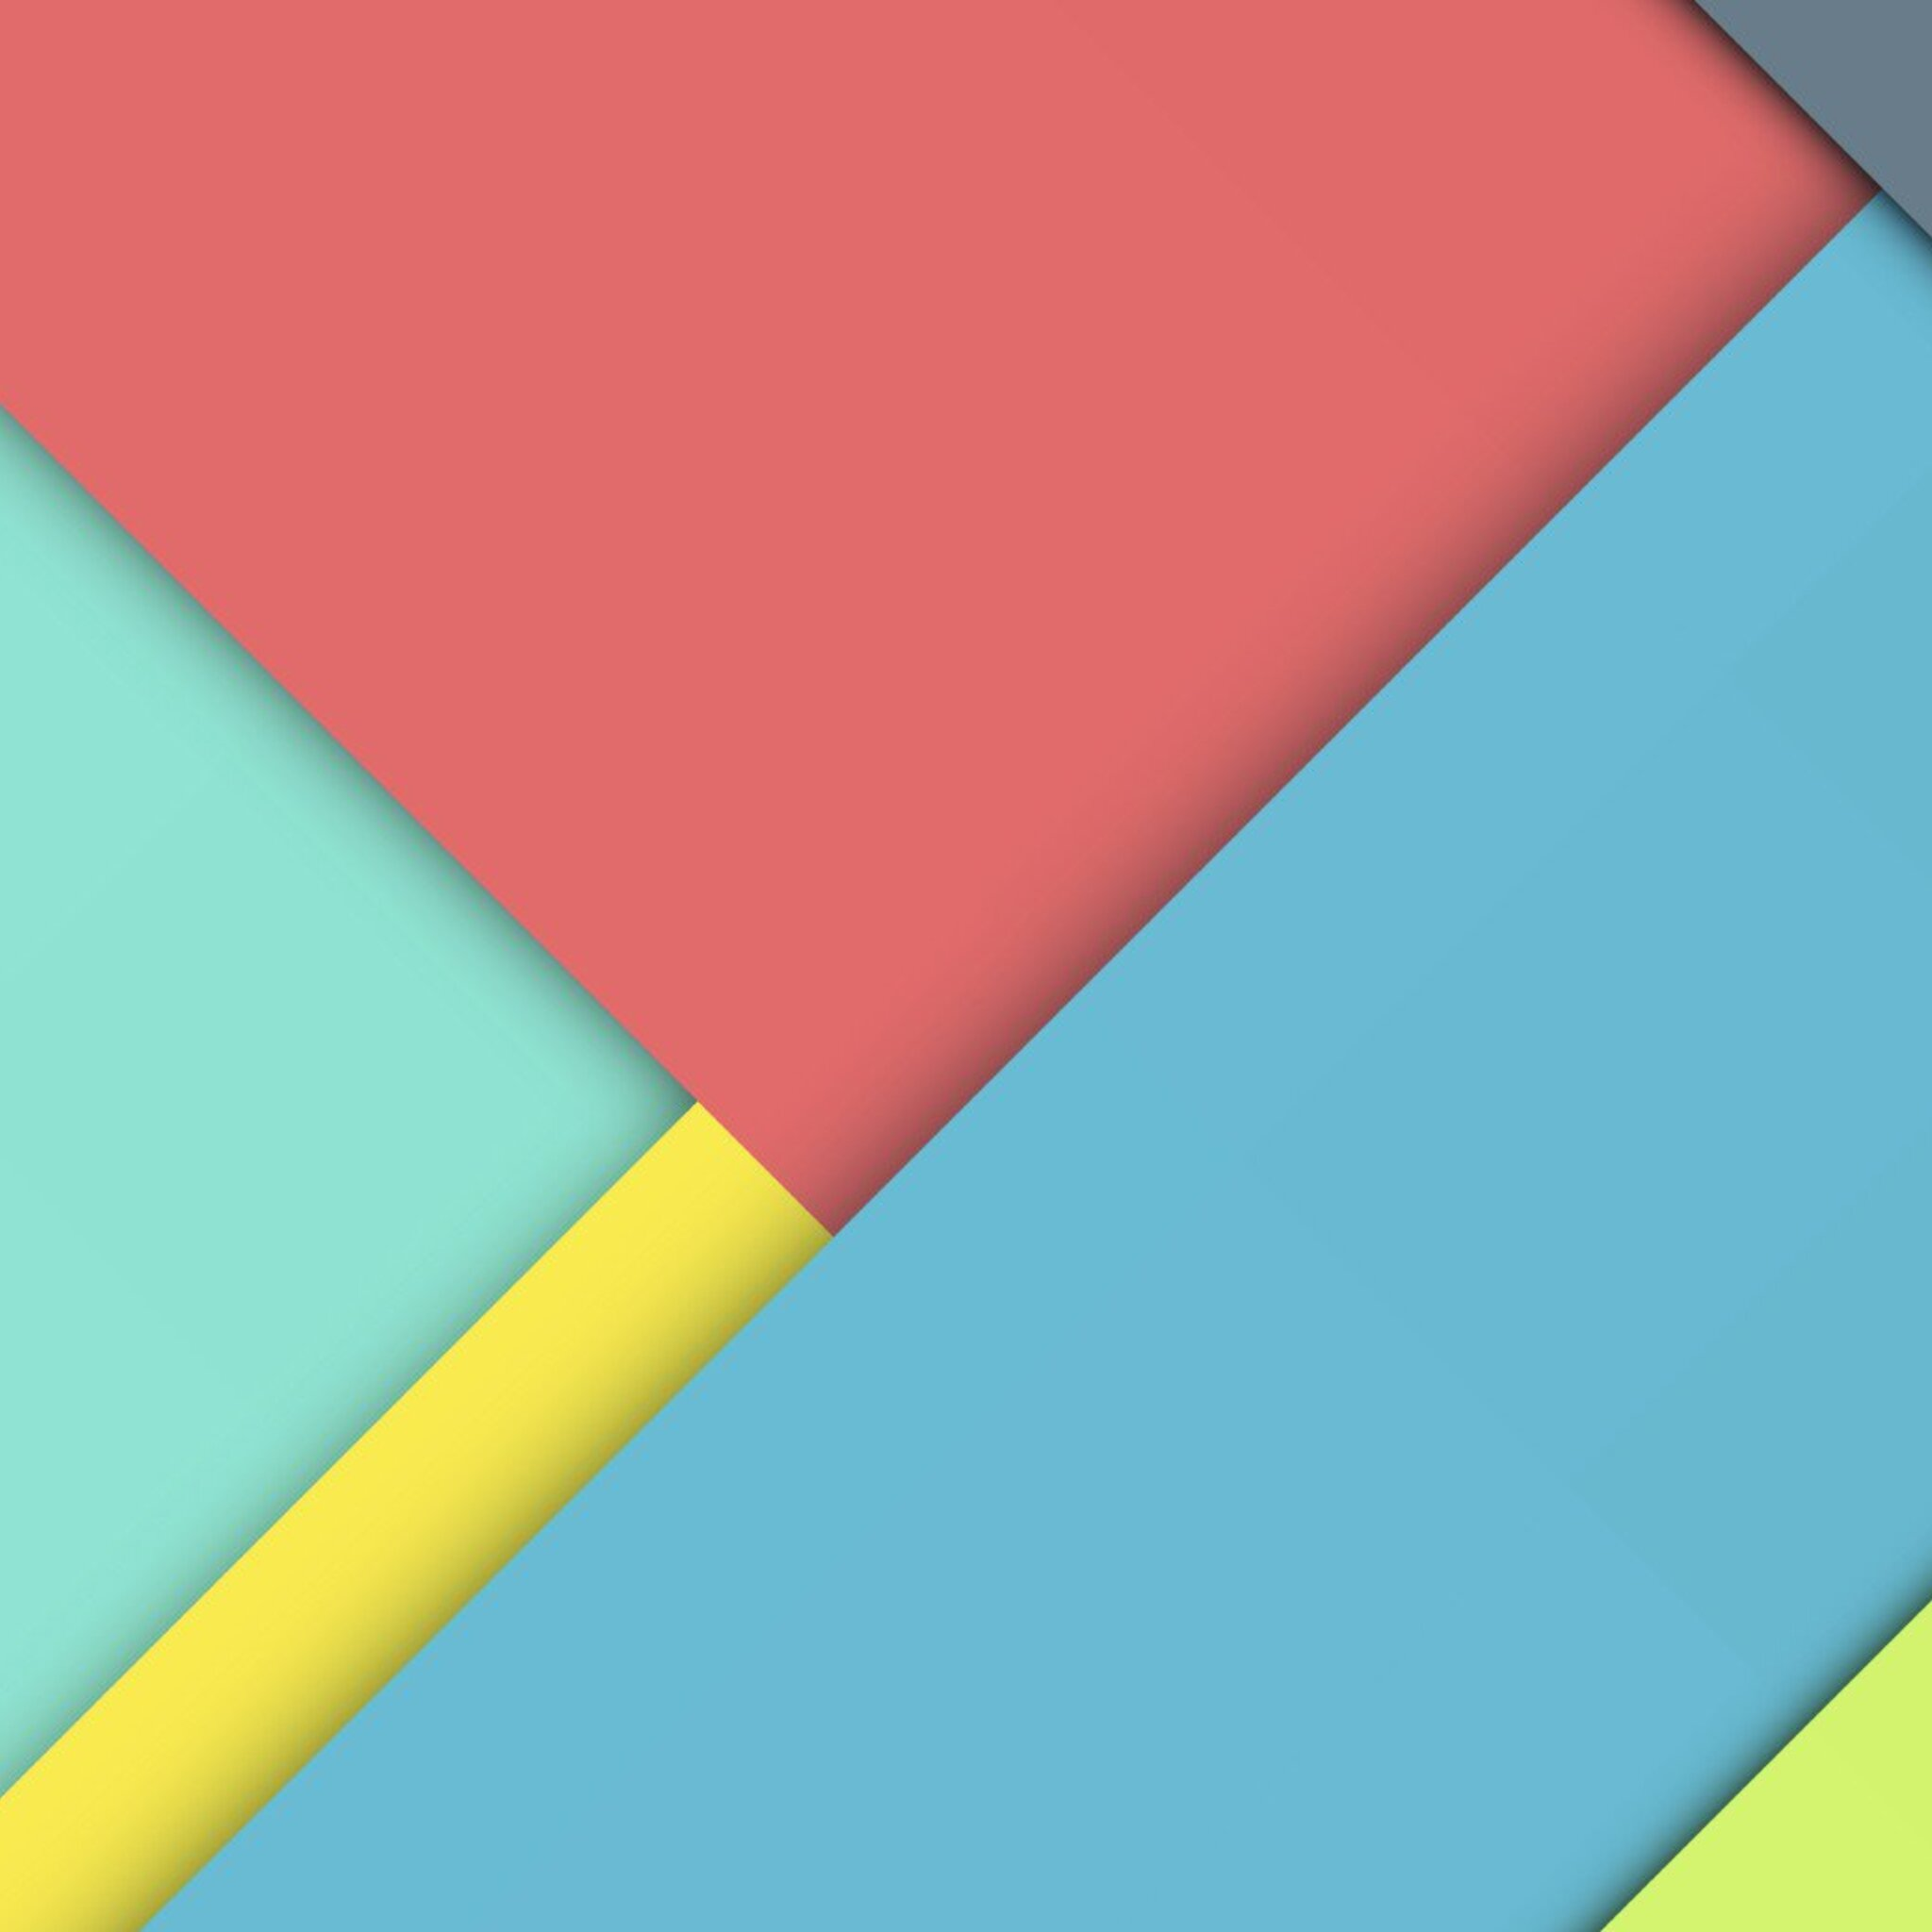 2048x2048 material design hd ipad air hd 4k wallpapers, images